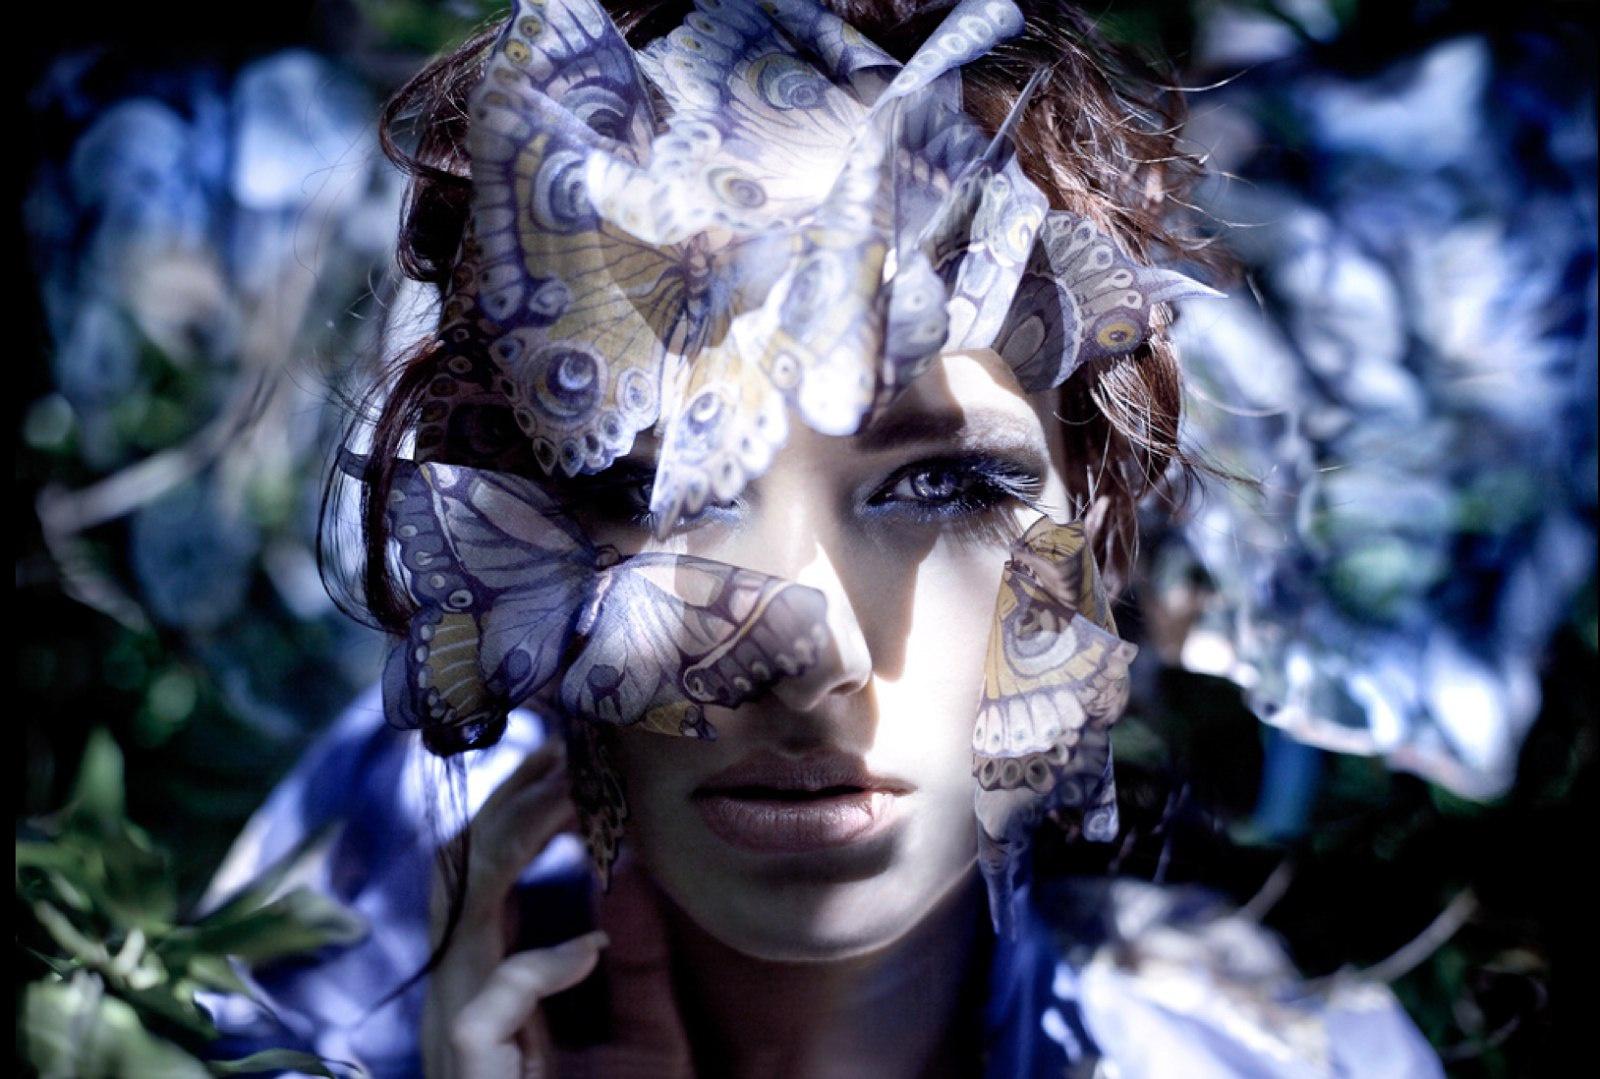 fairytale-photoshoot-photo-editing-sample